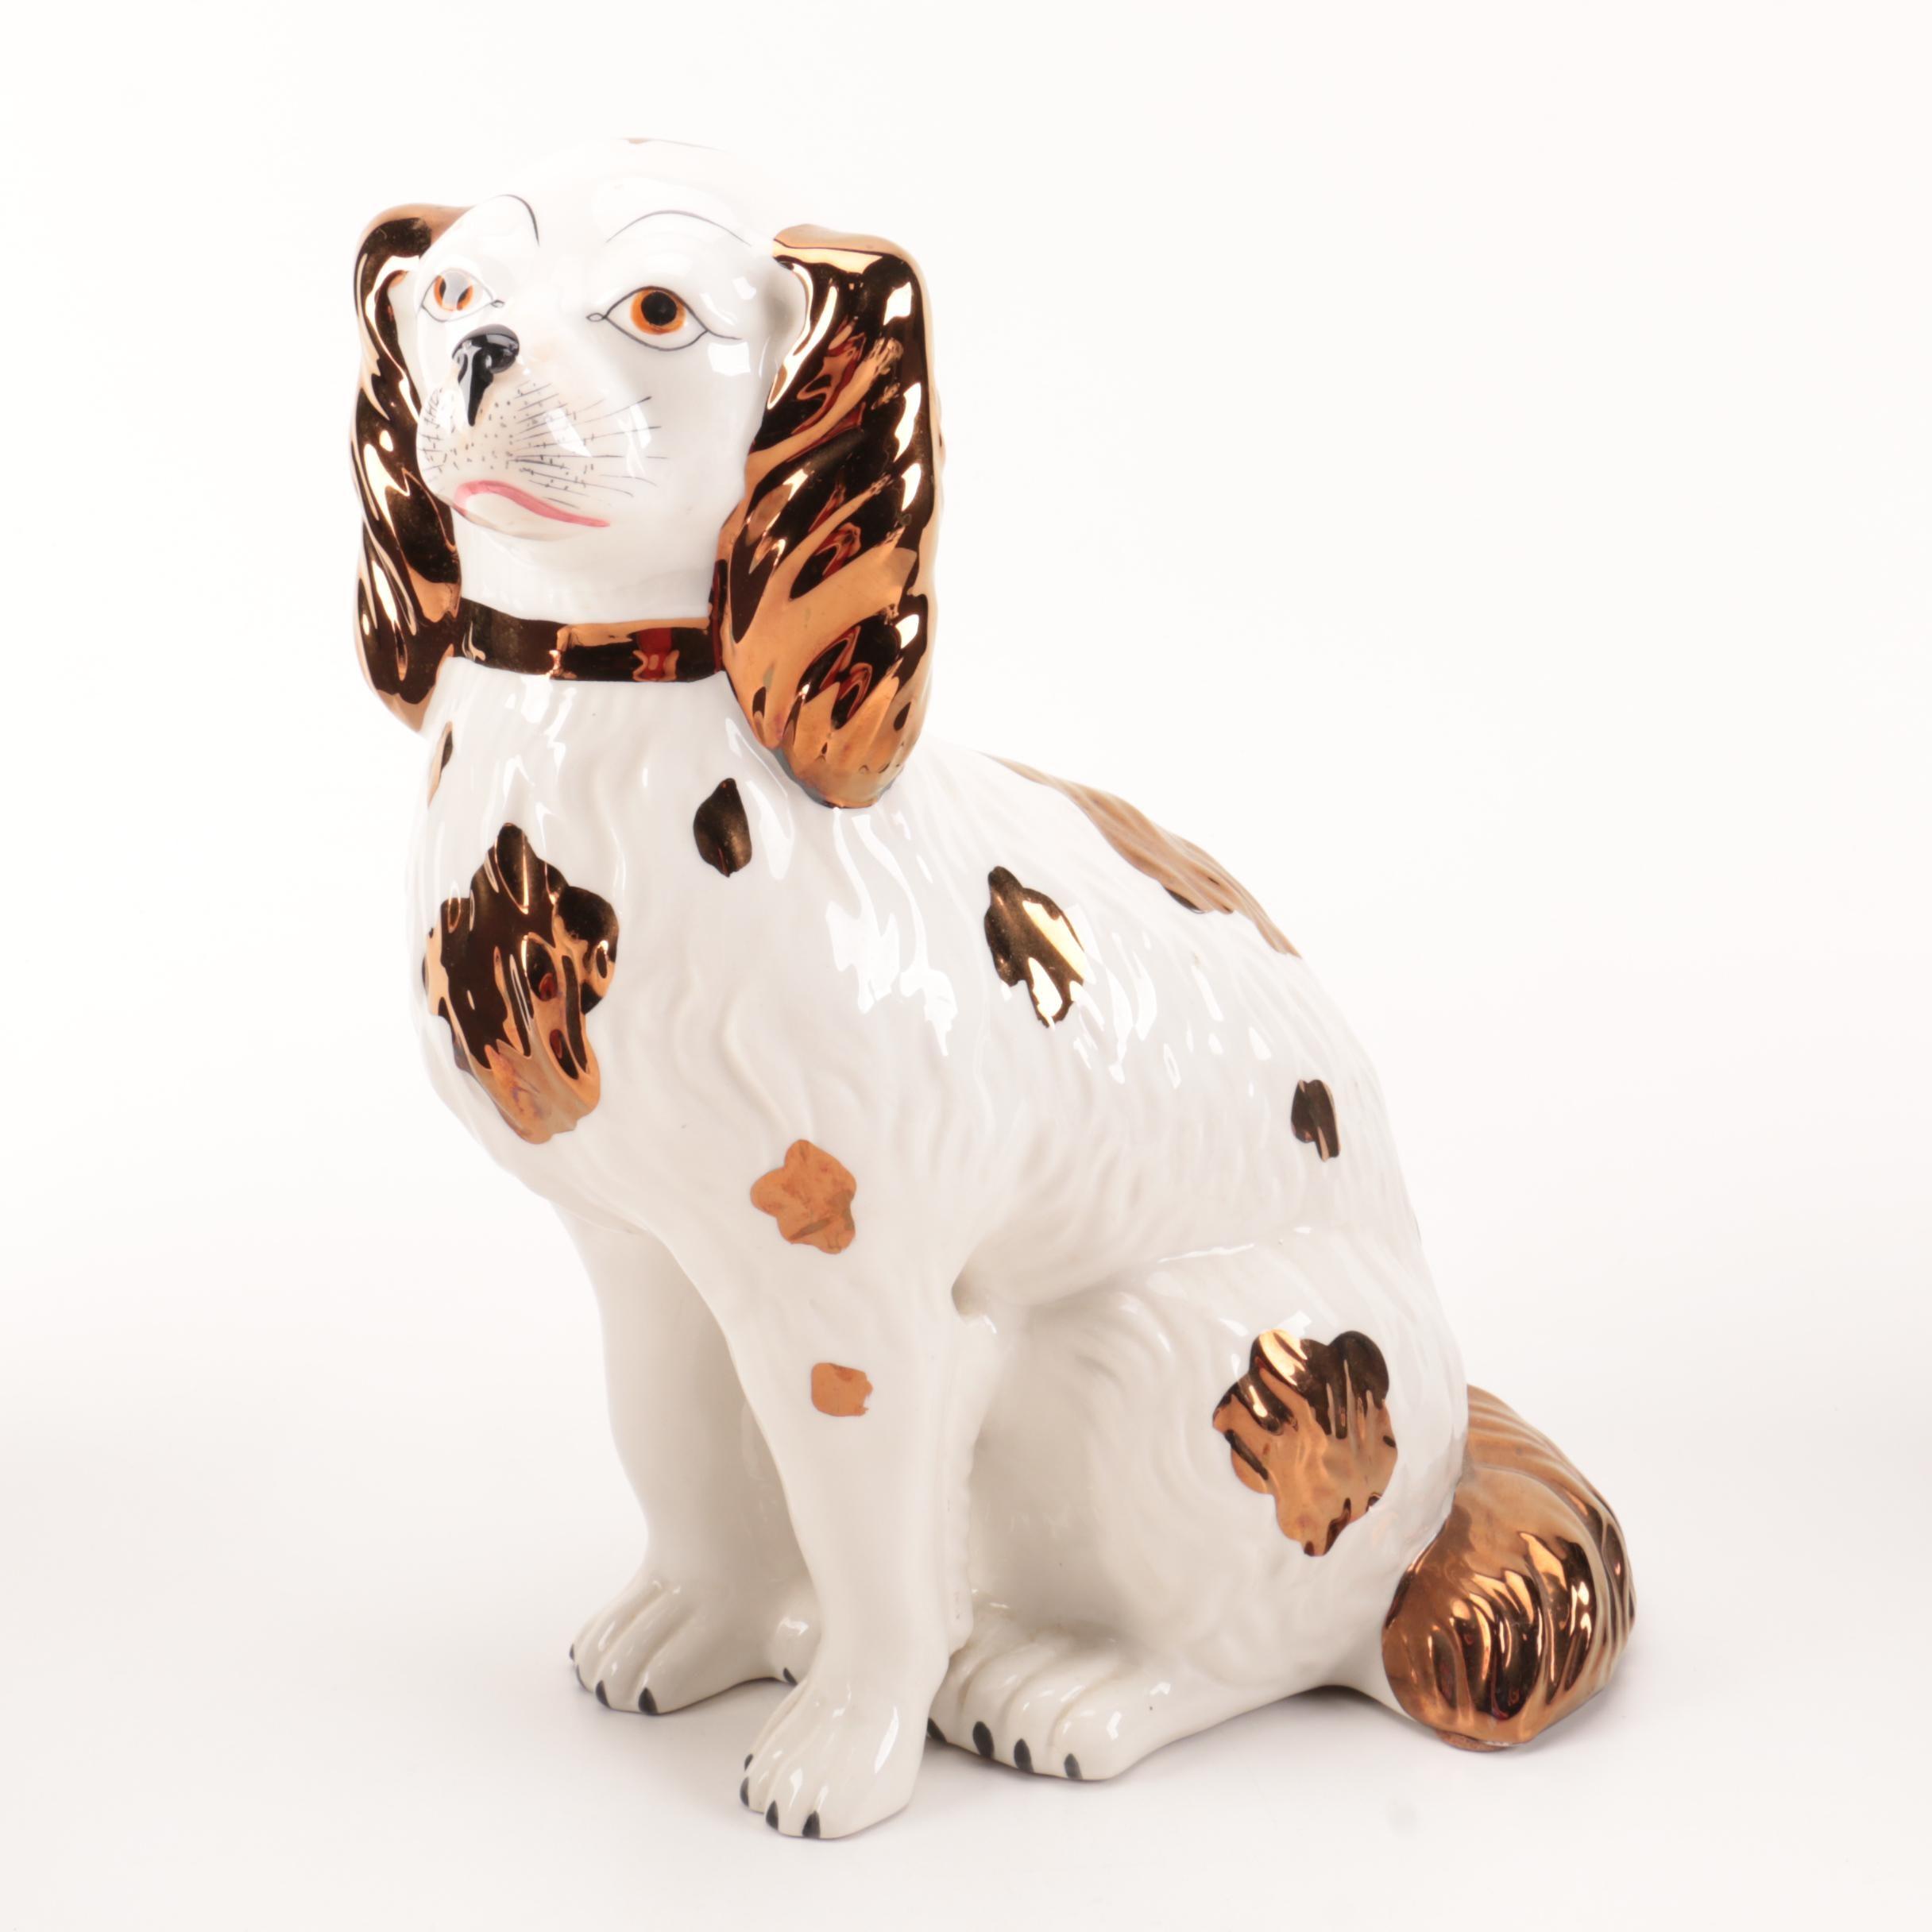 Cavalier King Charles Spaniel Ceramic Figurine